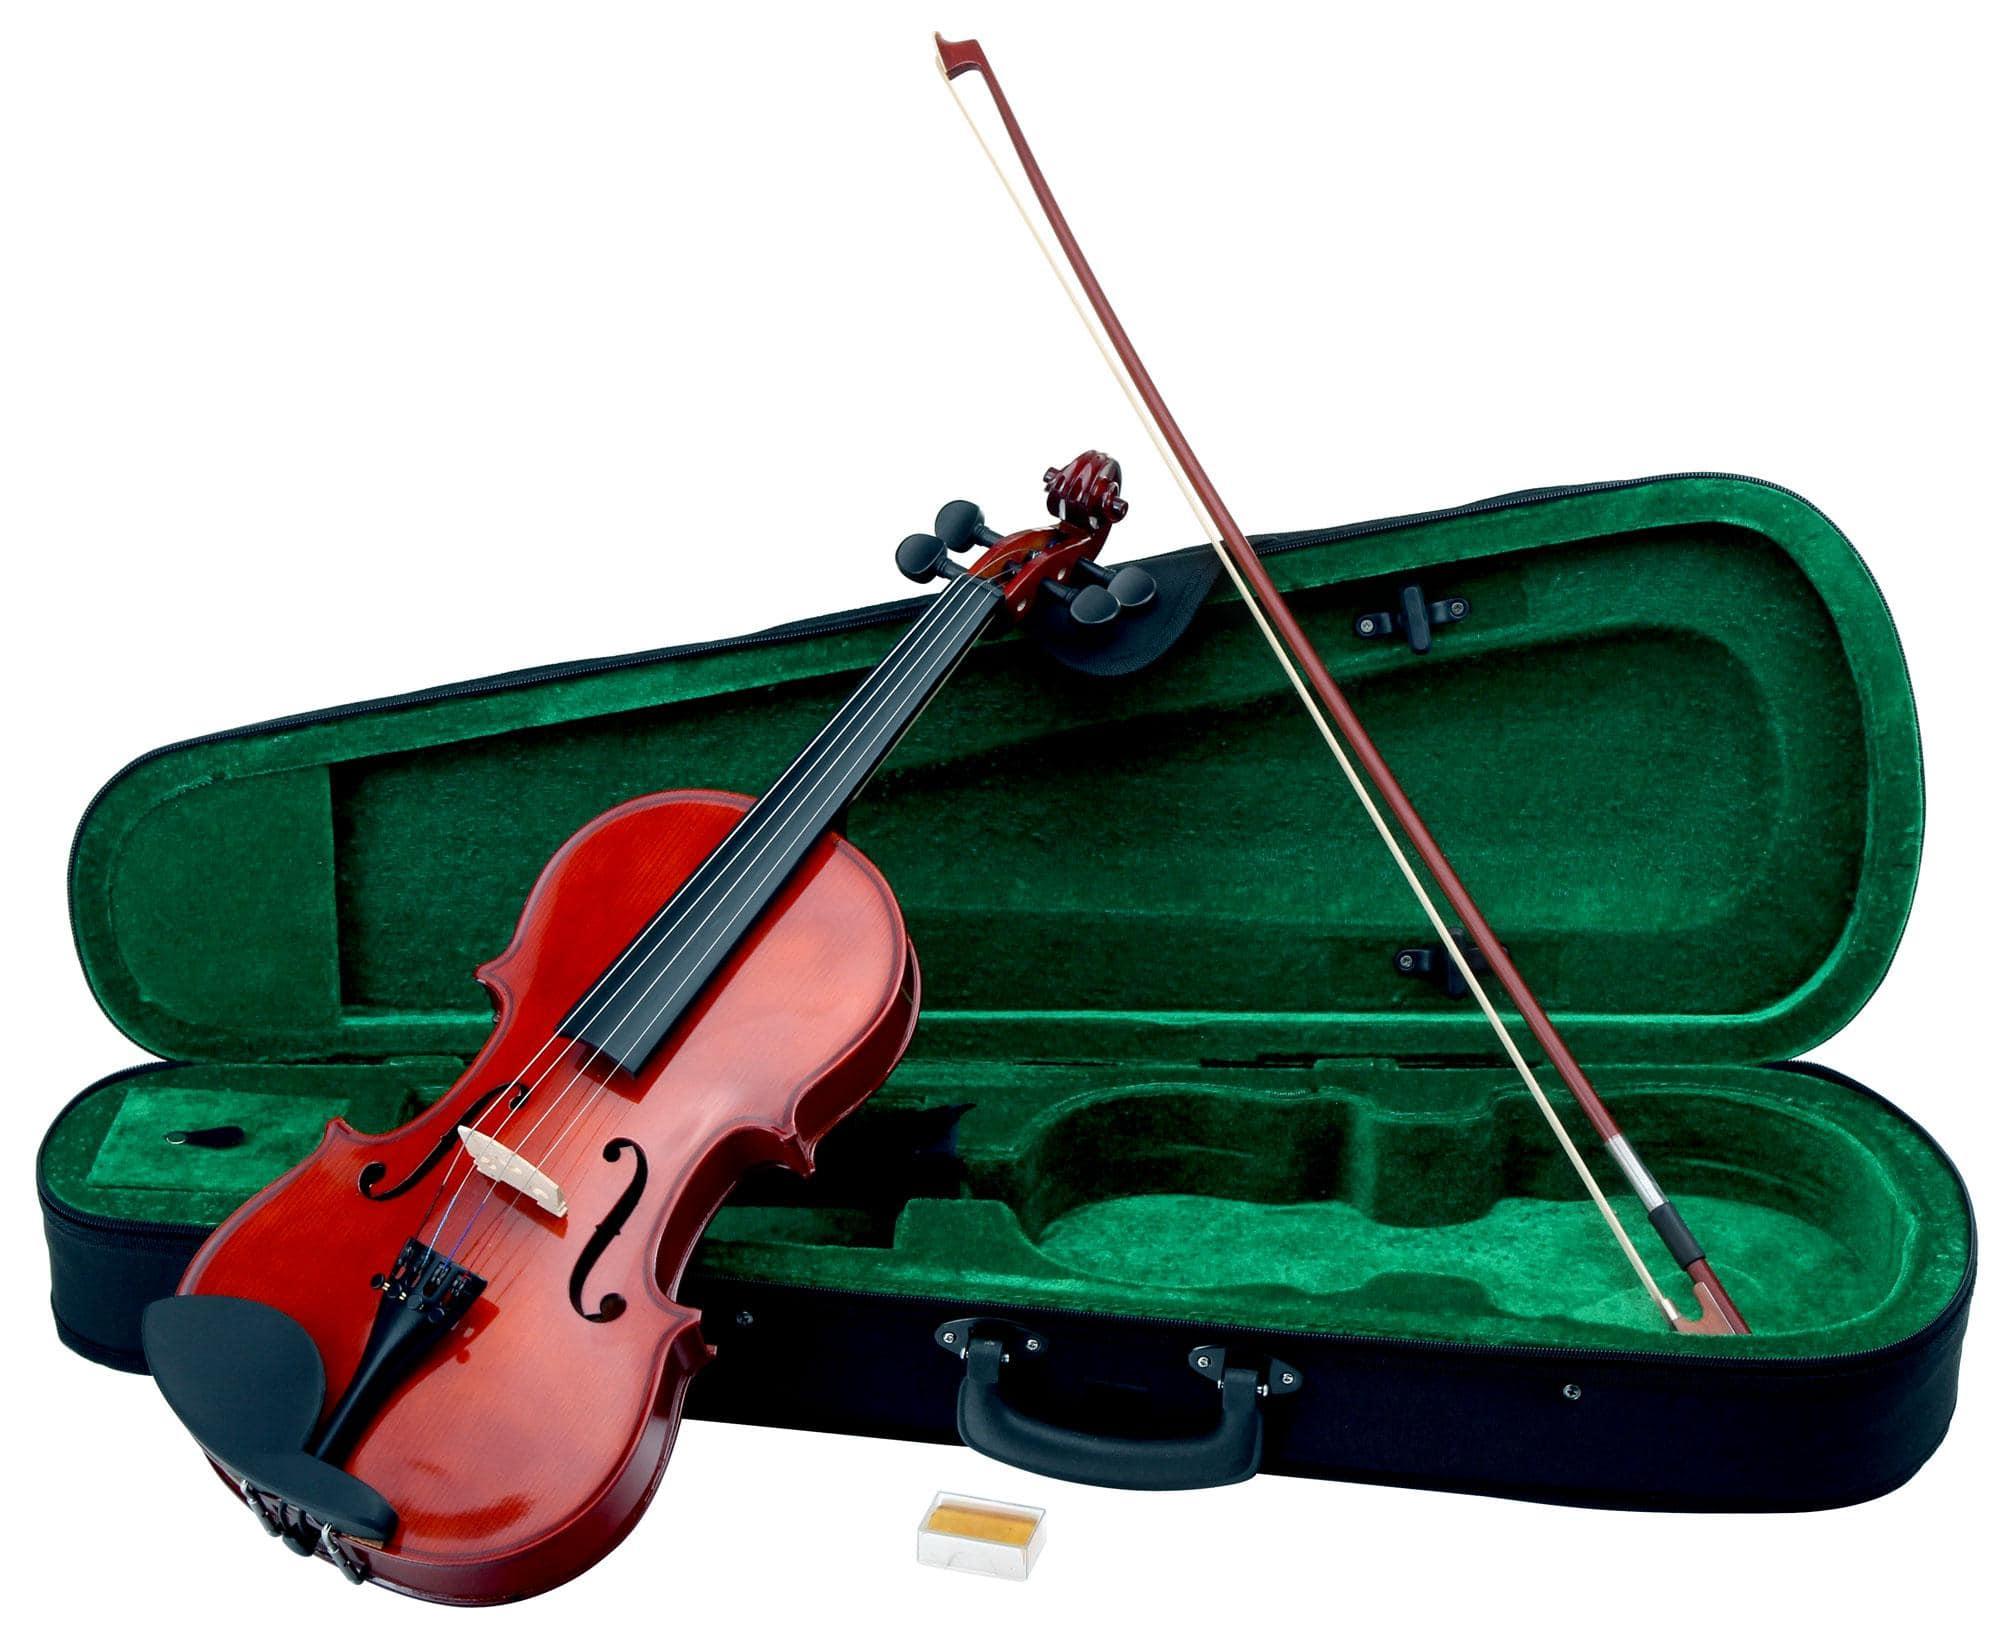 Violinen - Classic Cantabile VP 100 Violinset 4|4 - Onlineshop Musikhaus Kirstein